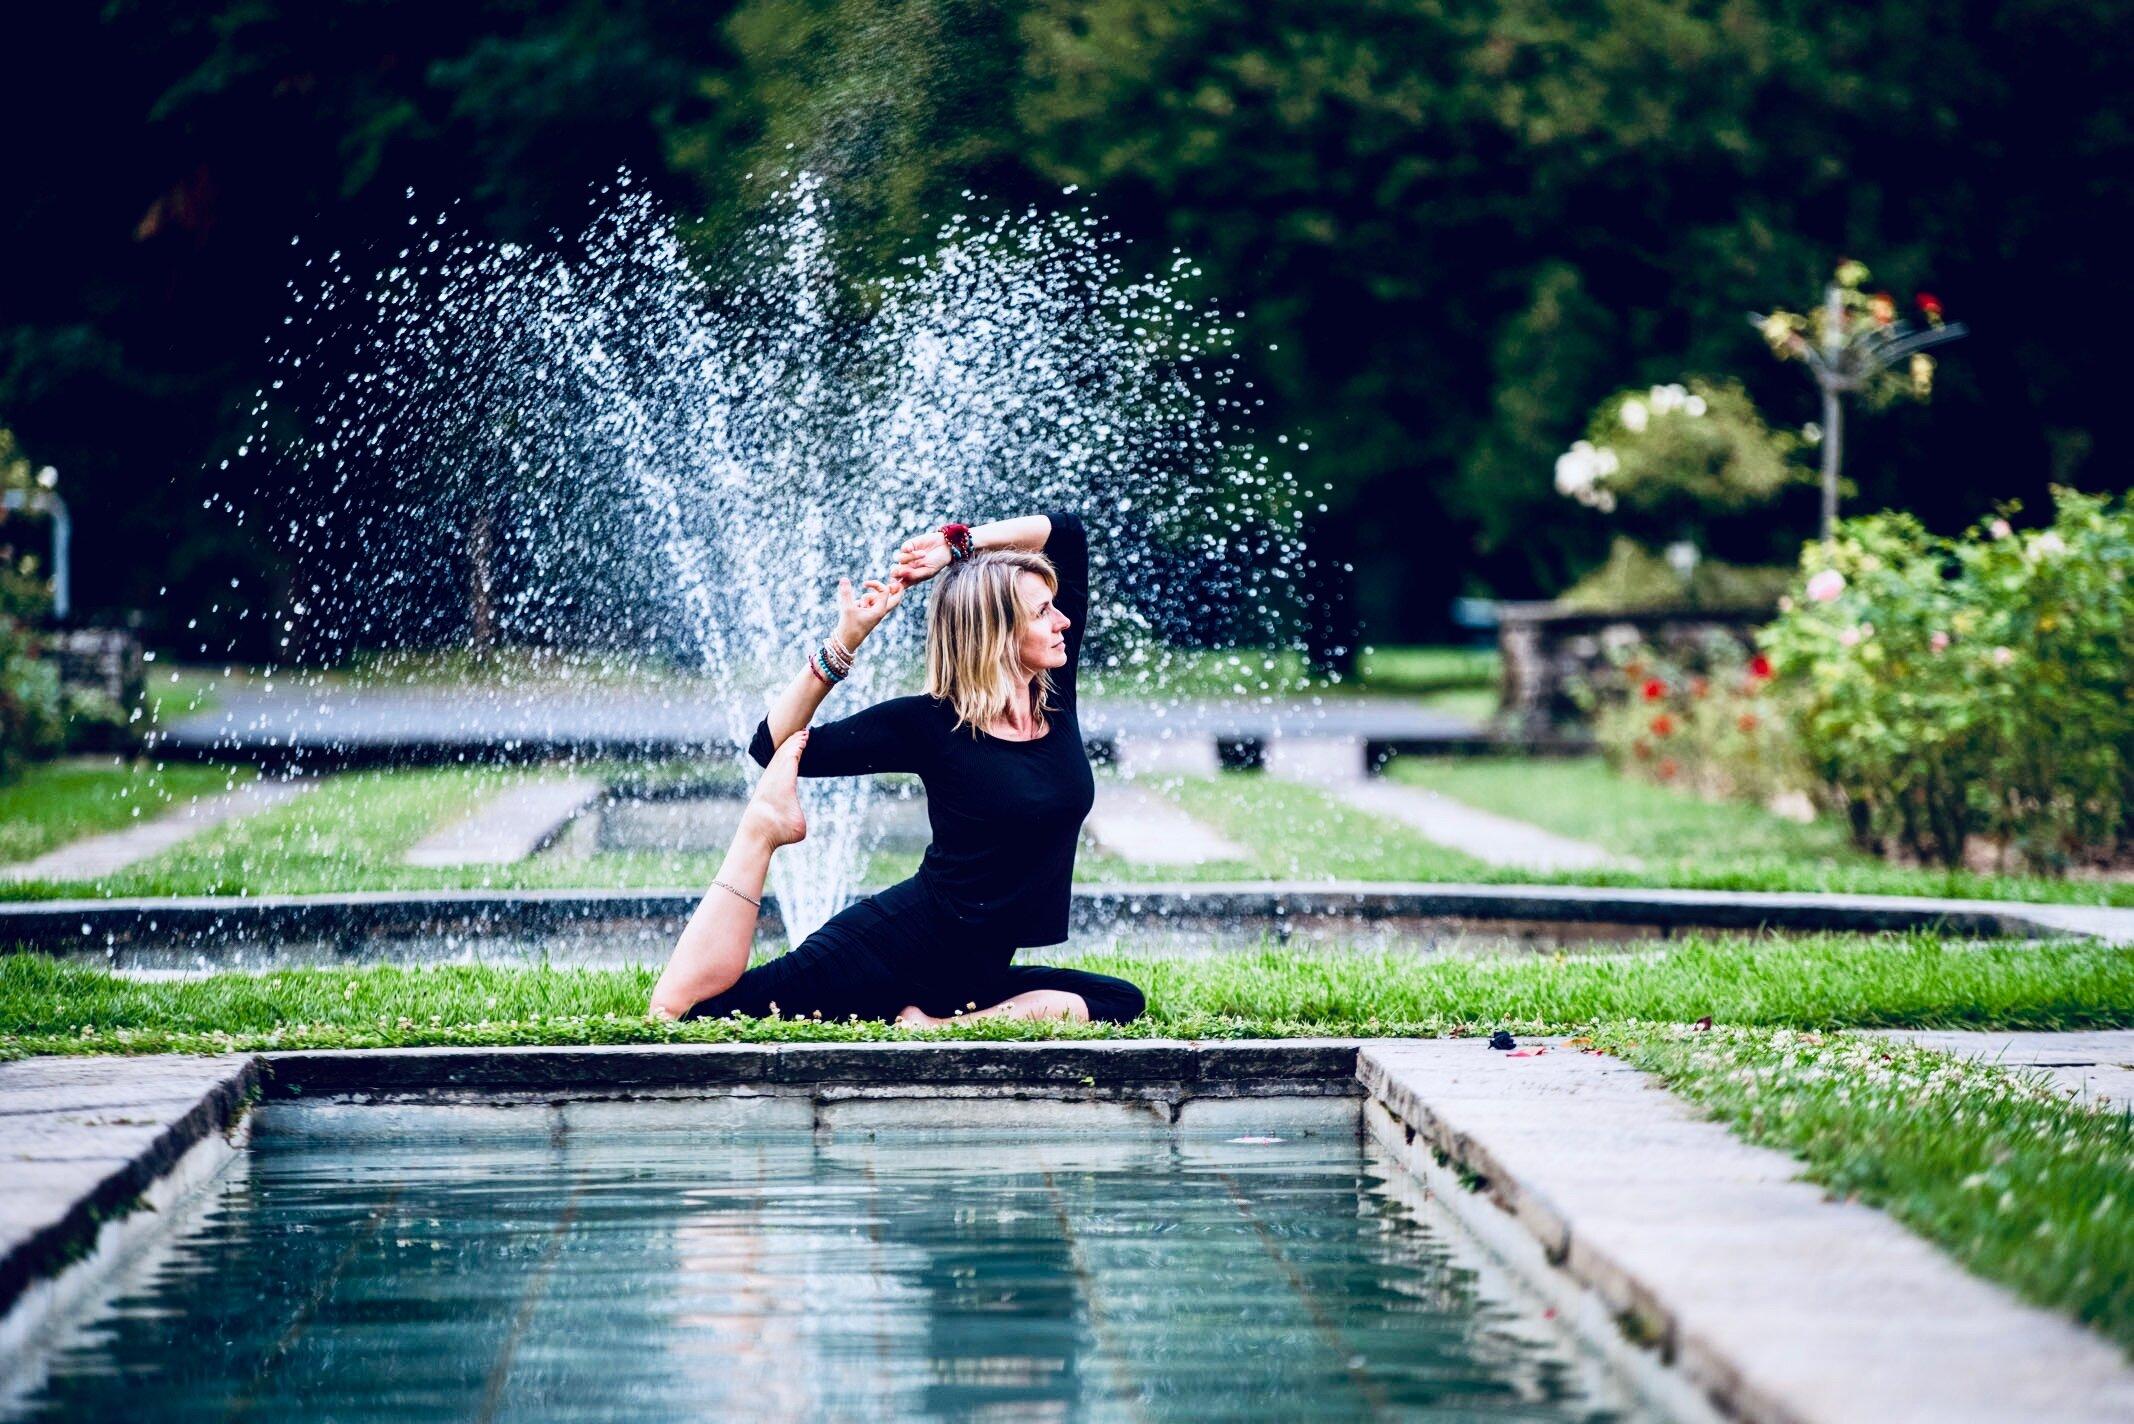 Yoga_mermaid8 (1).jpg